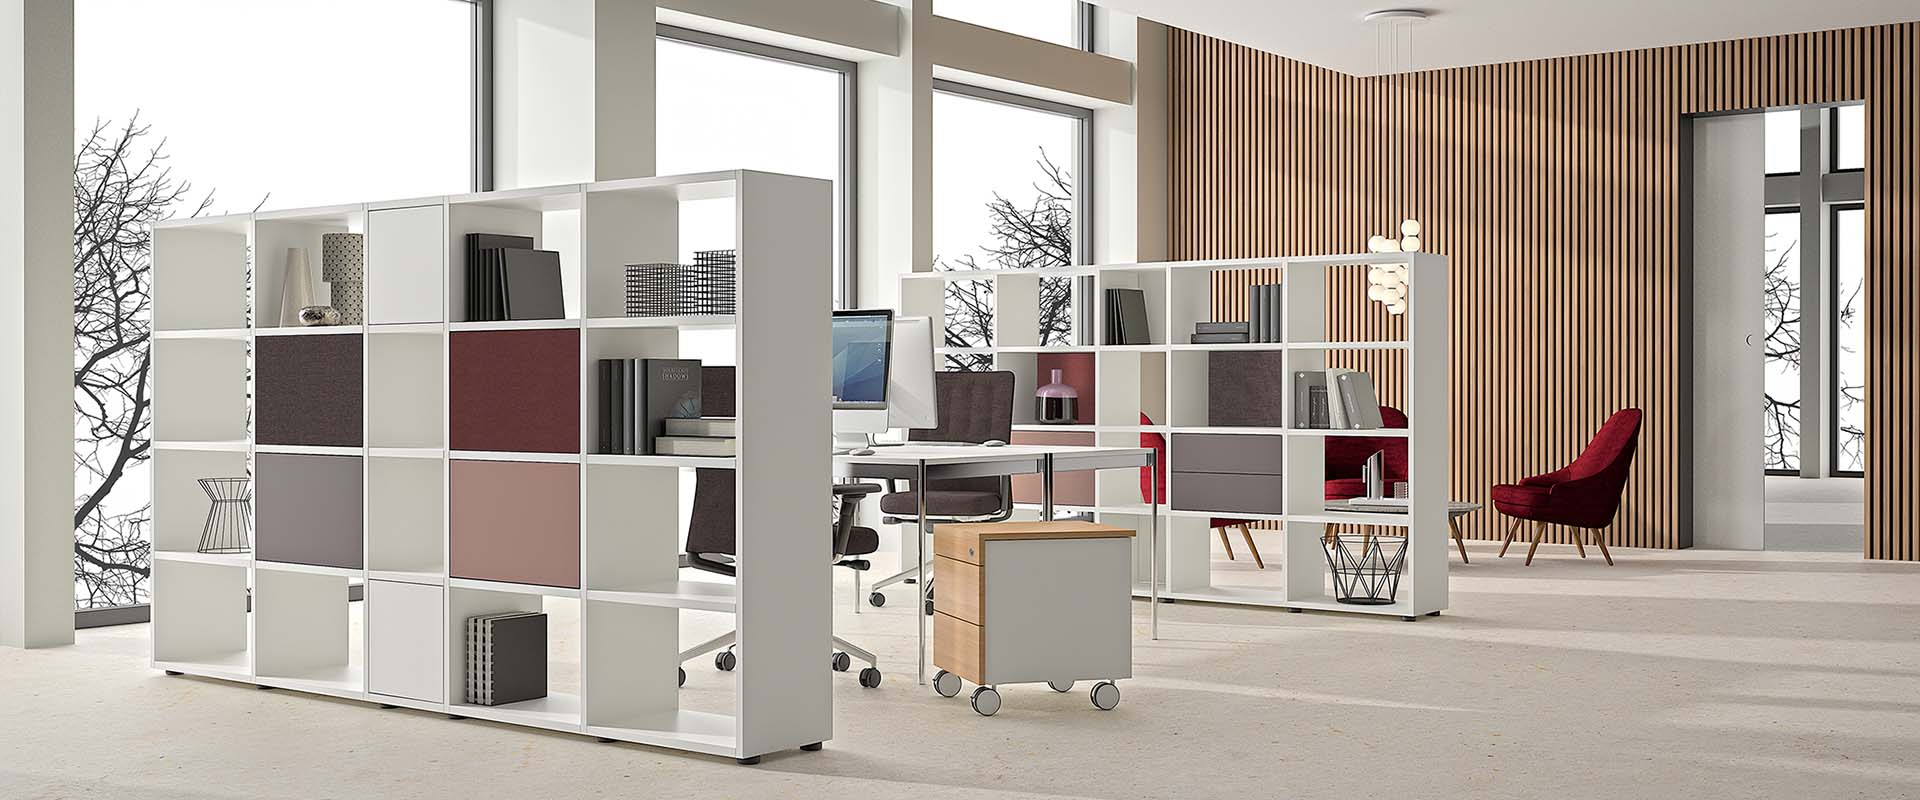 basic view Büroregale als Raumtrenner